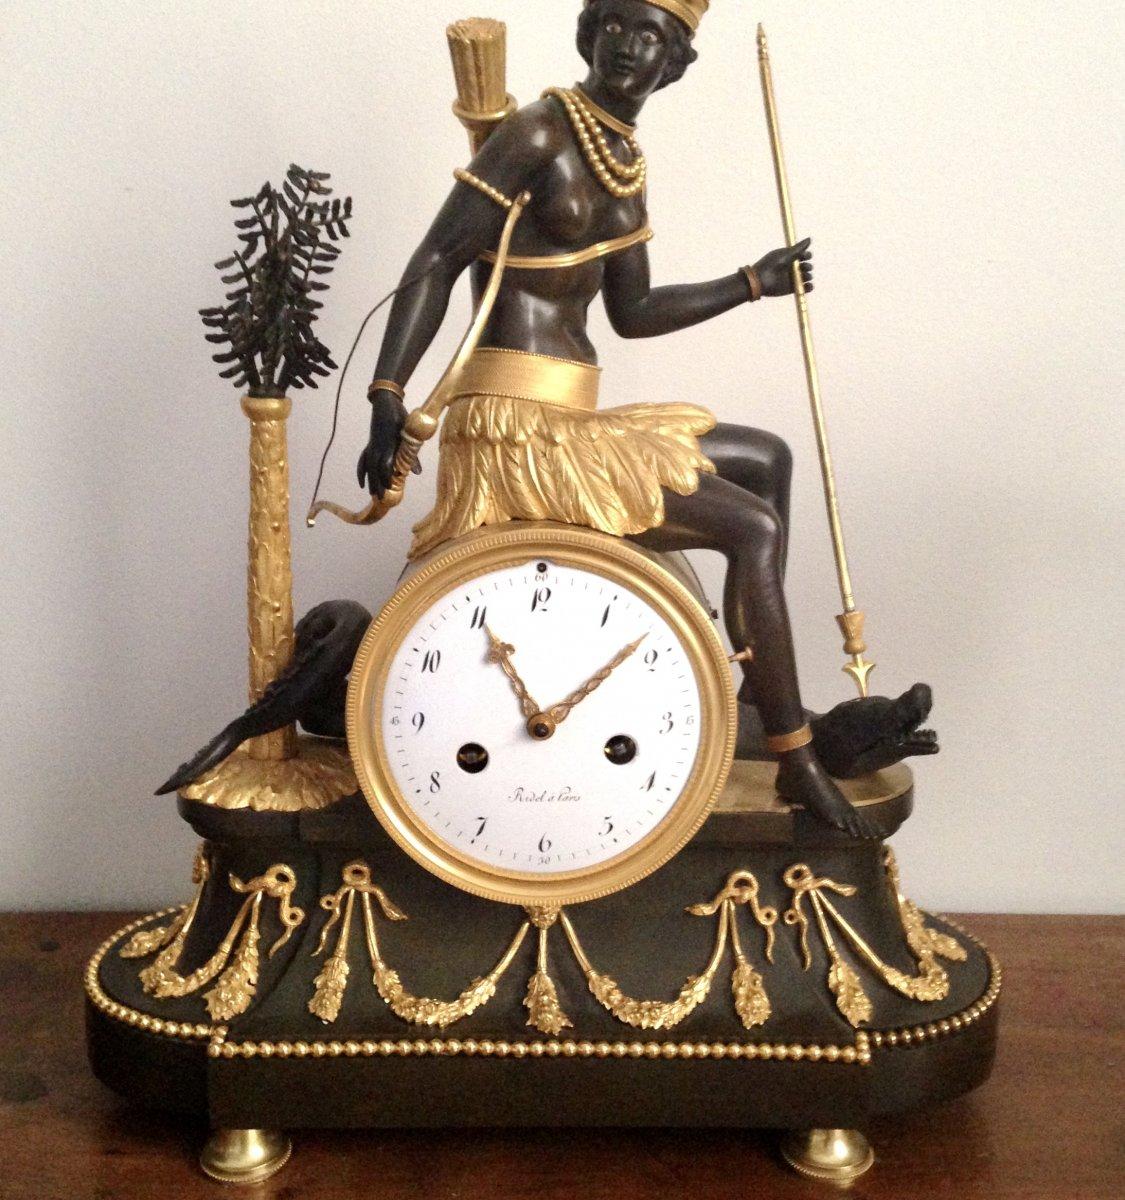 Horlogerie Girardot